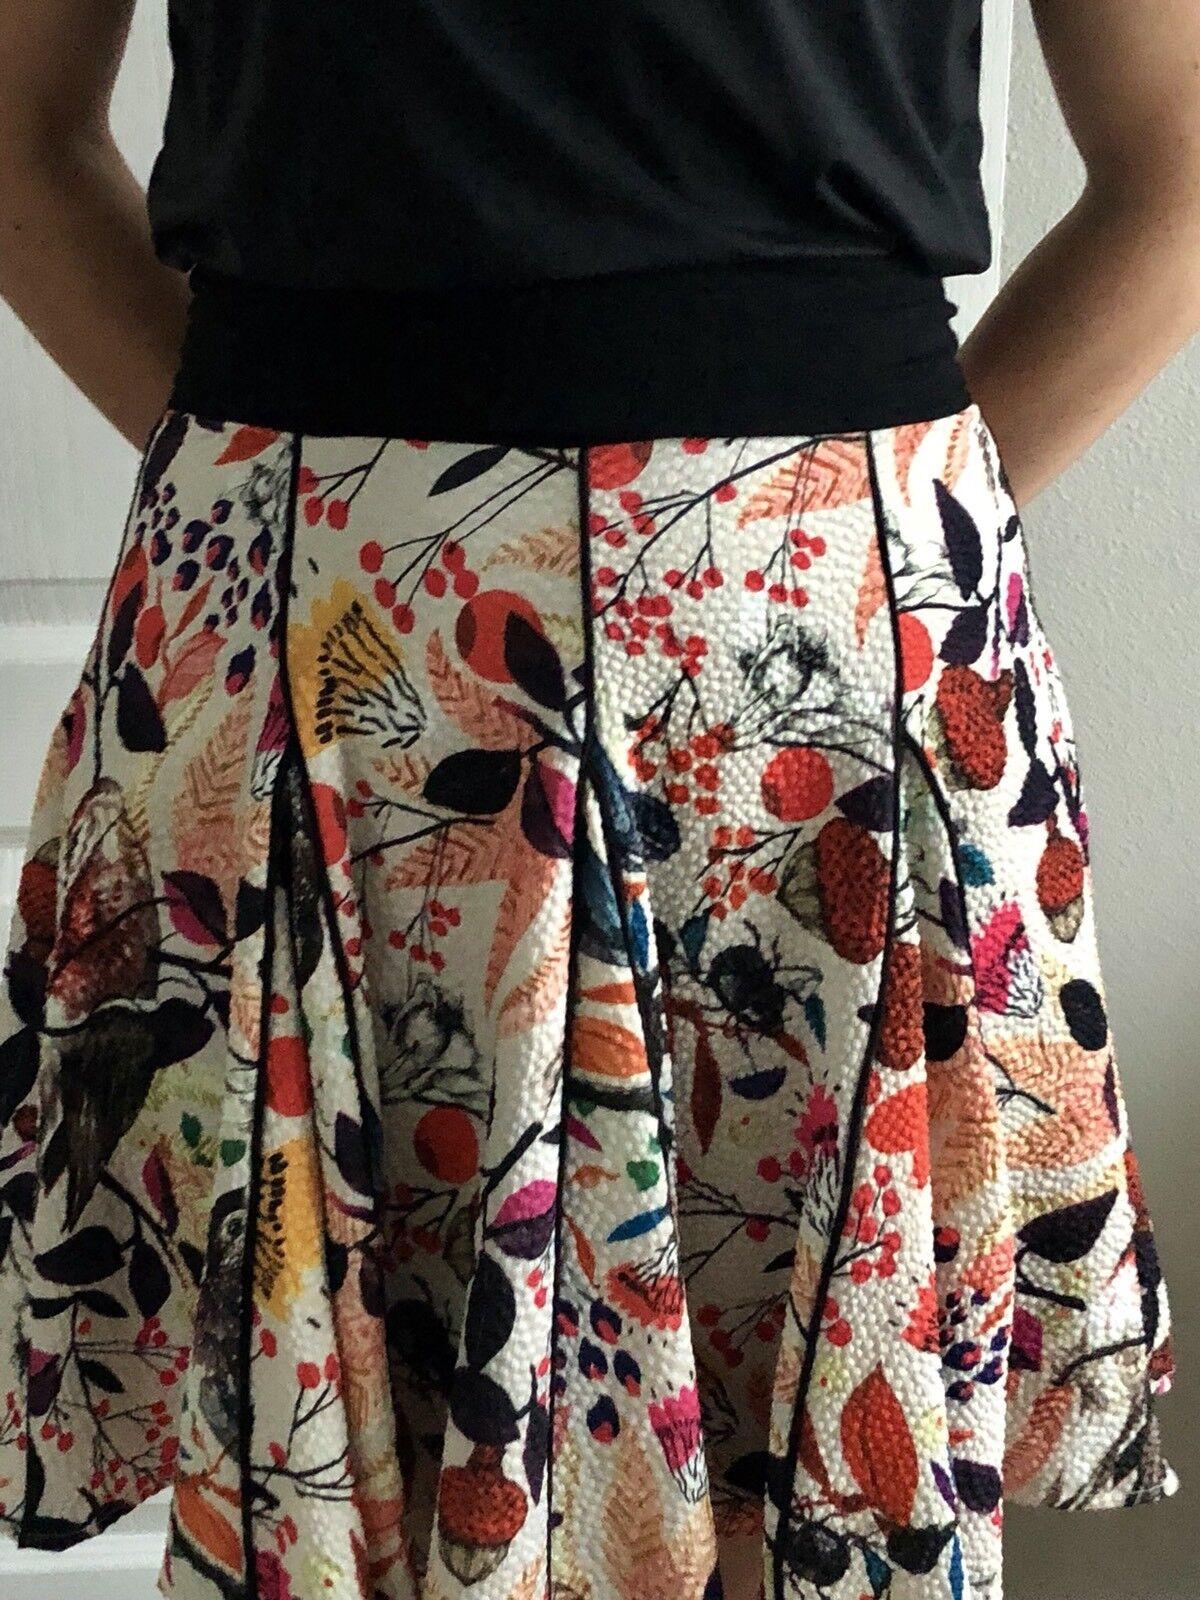 Anthropologie Eva Franco Songbird Swing Floral Skirt Size 0 (also fits sz. 2)